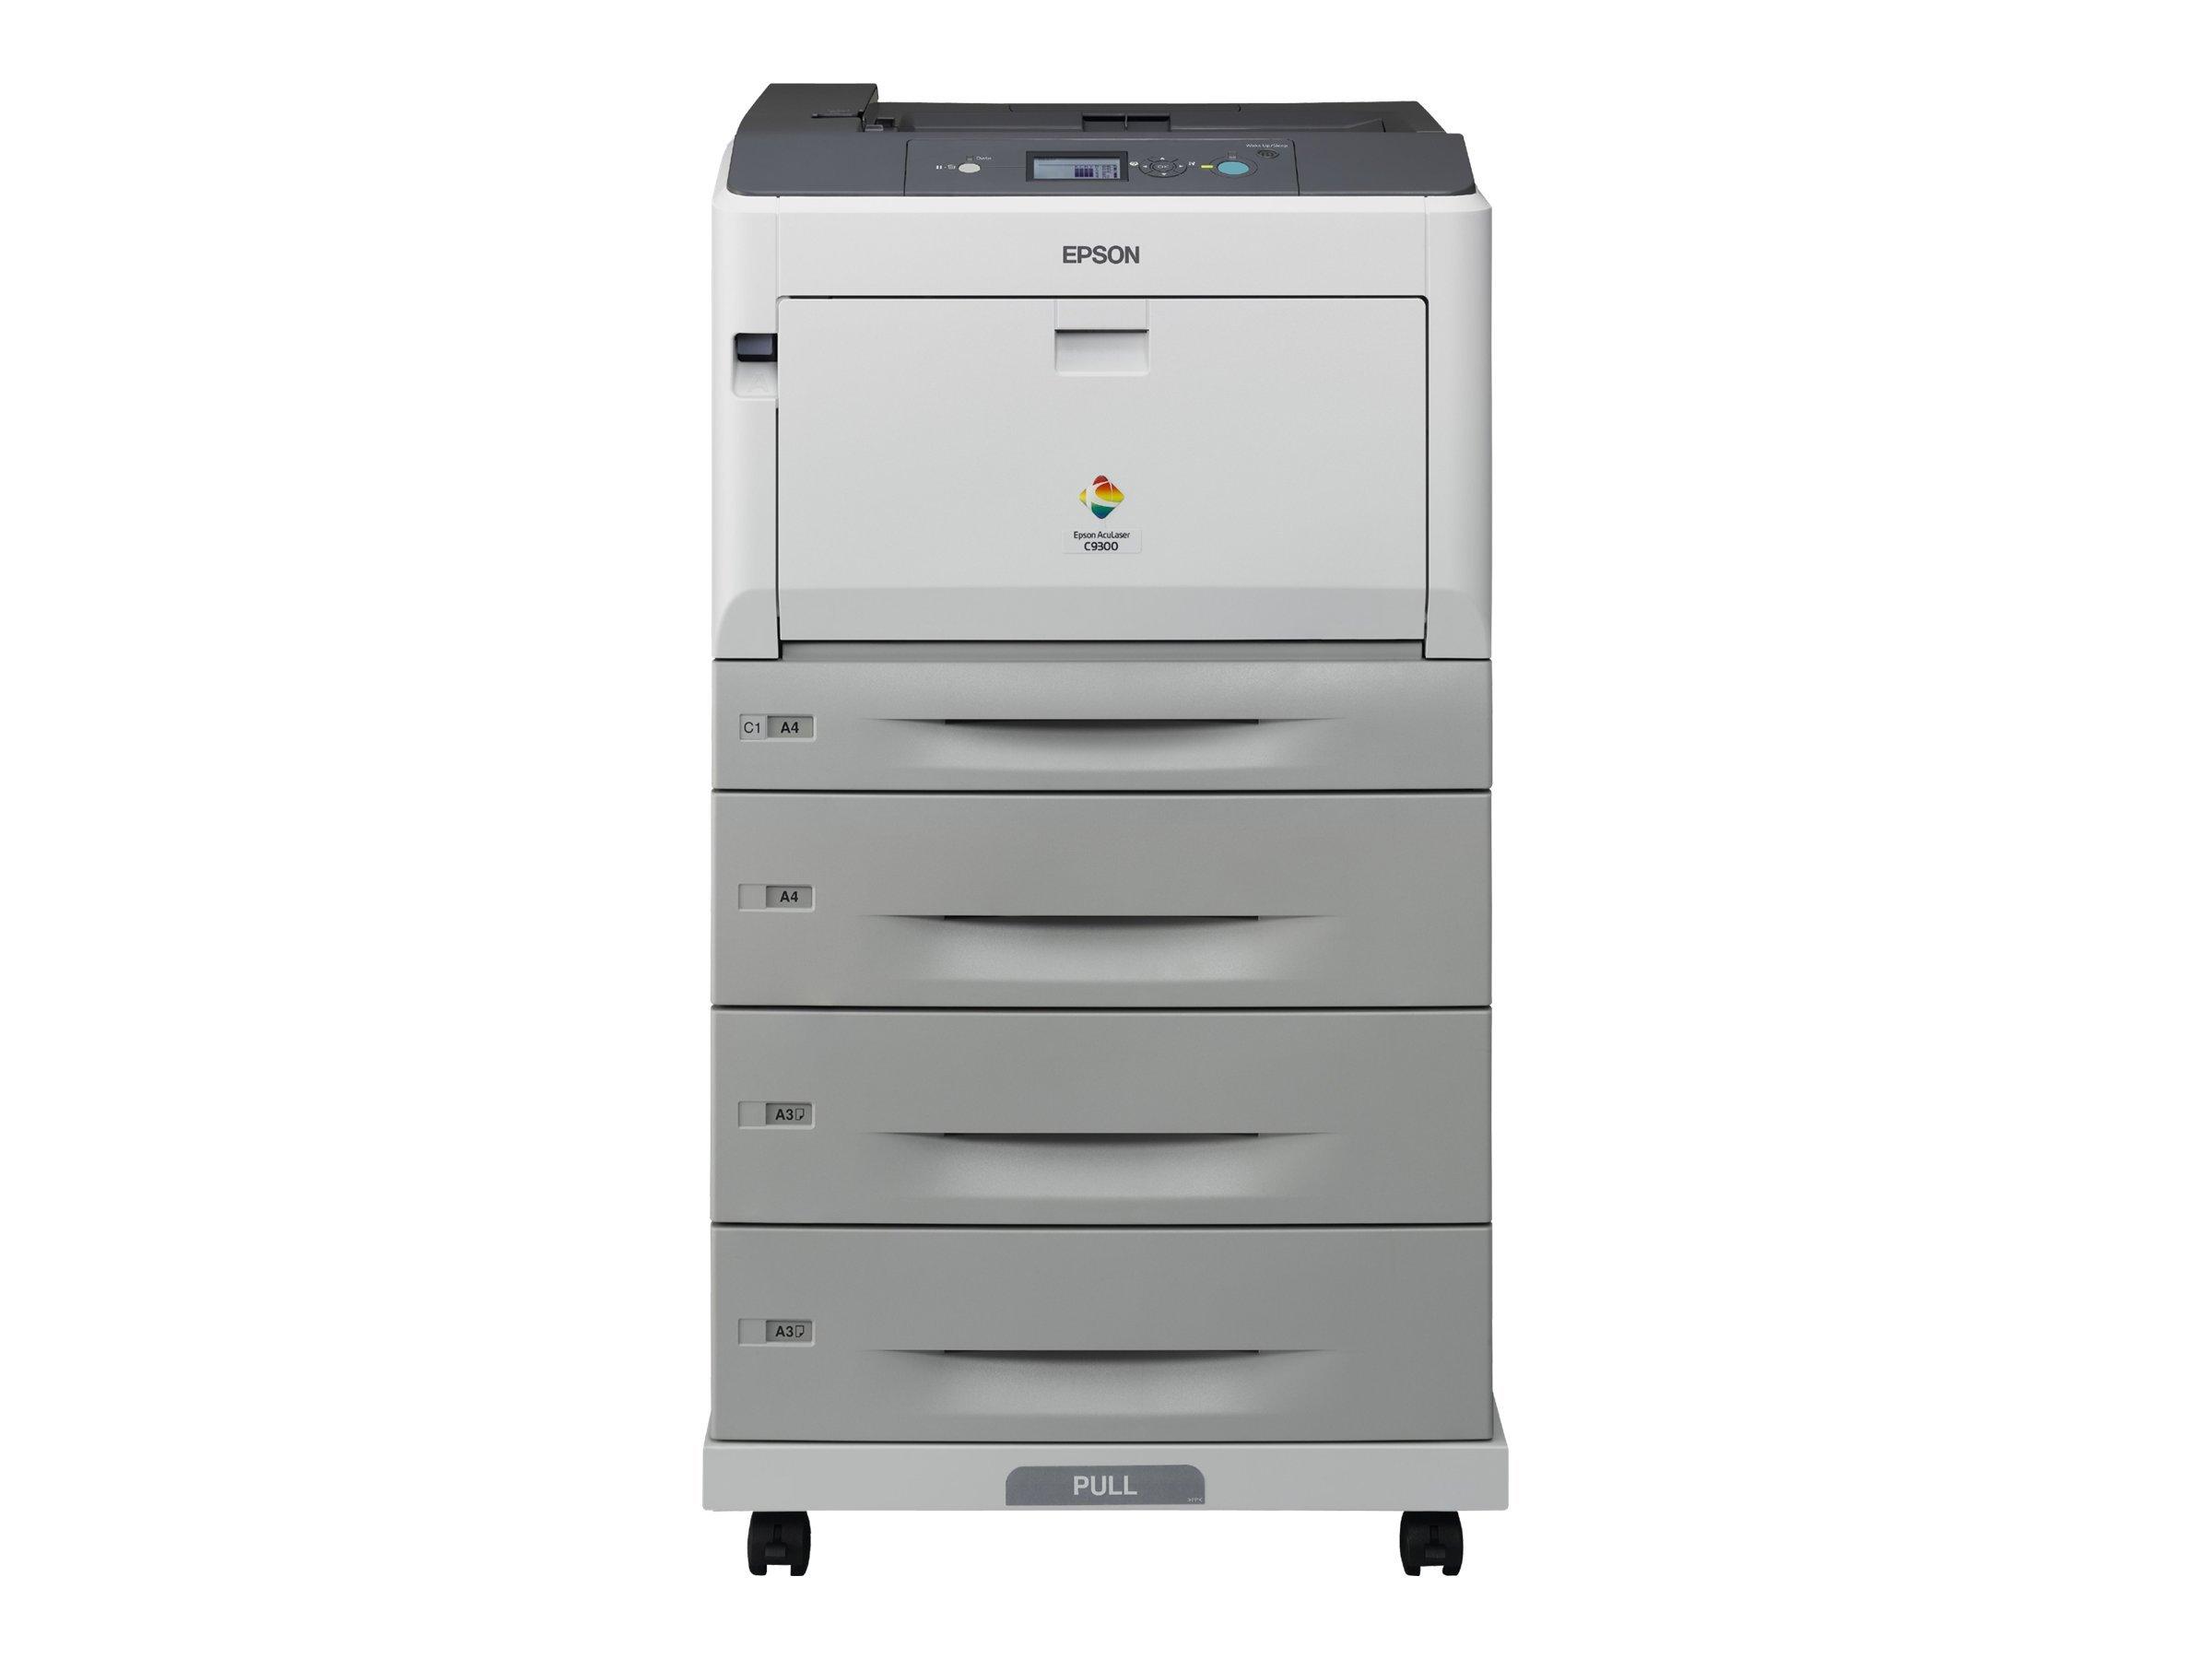 Epson AcuLaser C9300D3TNC - Drucker - Farbe - Duplex - Laser - A3/Ledger